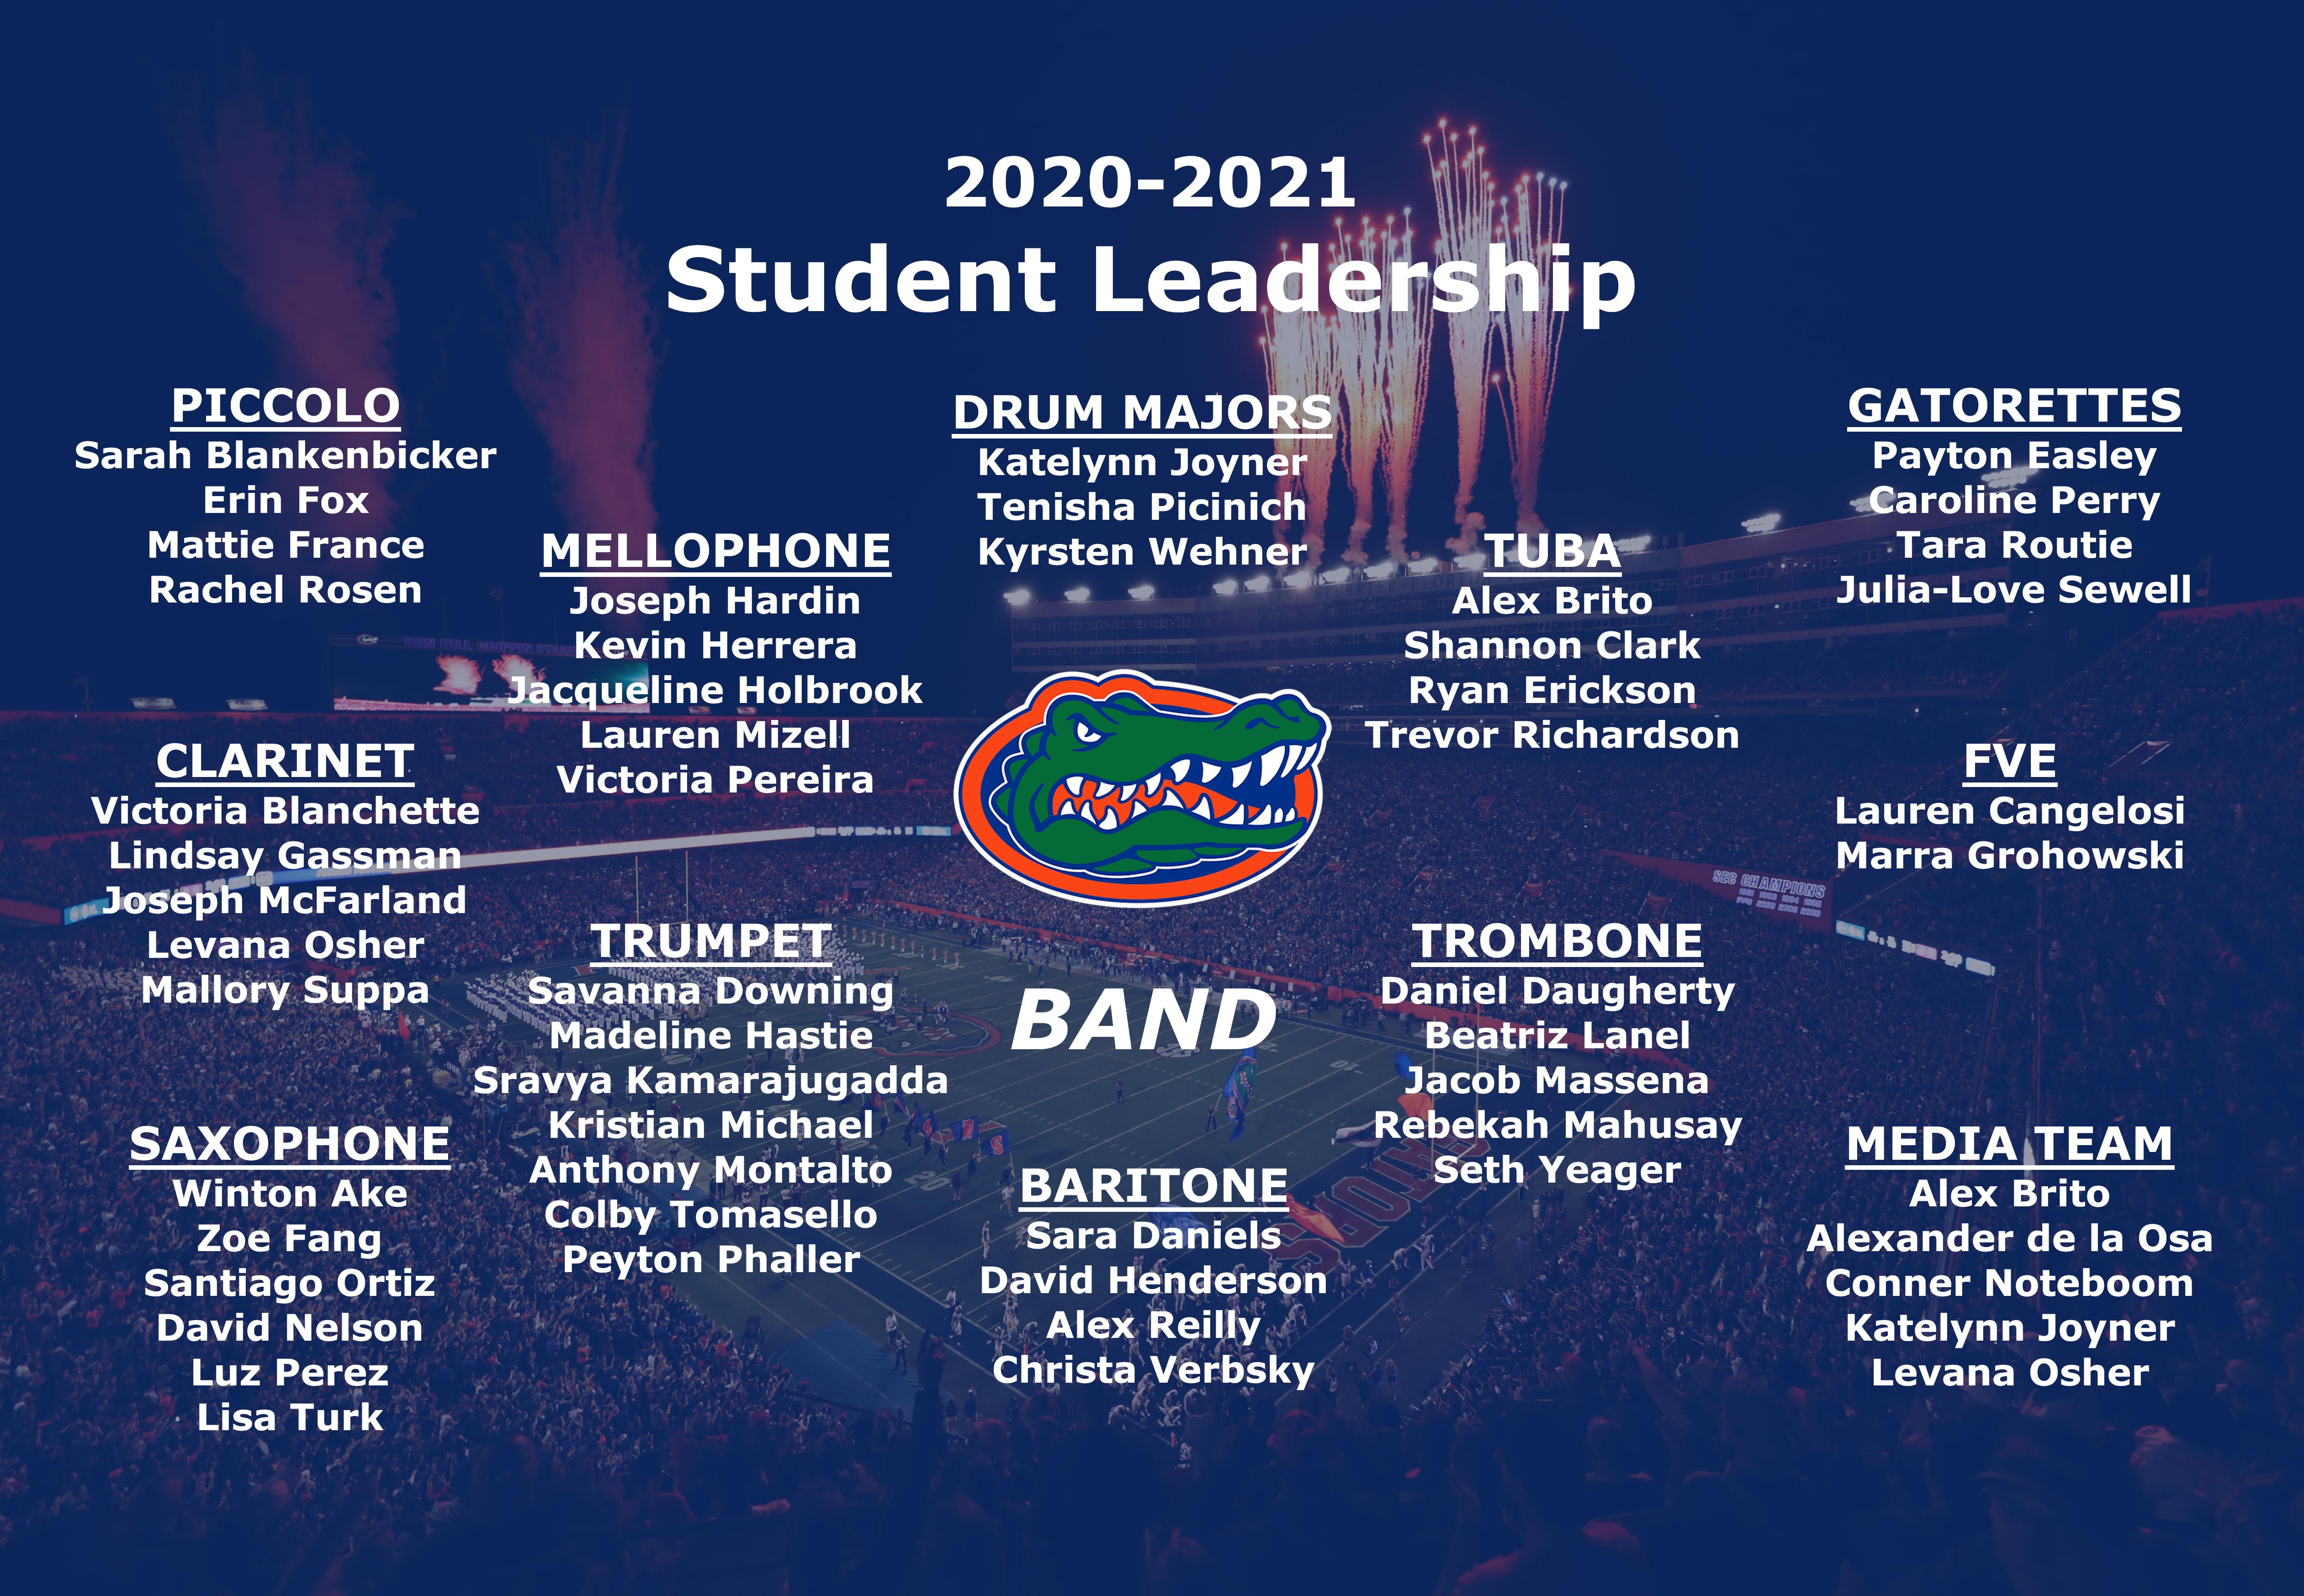 2020-2021_STUDENT_LEADERSHIP_FINAL (1)